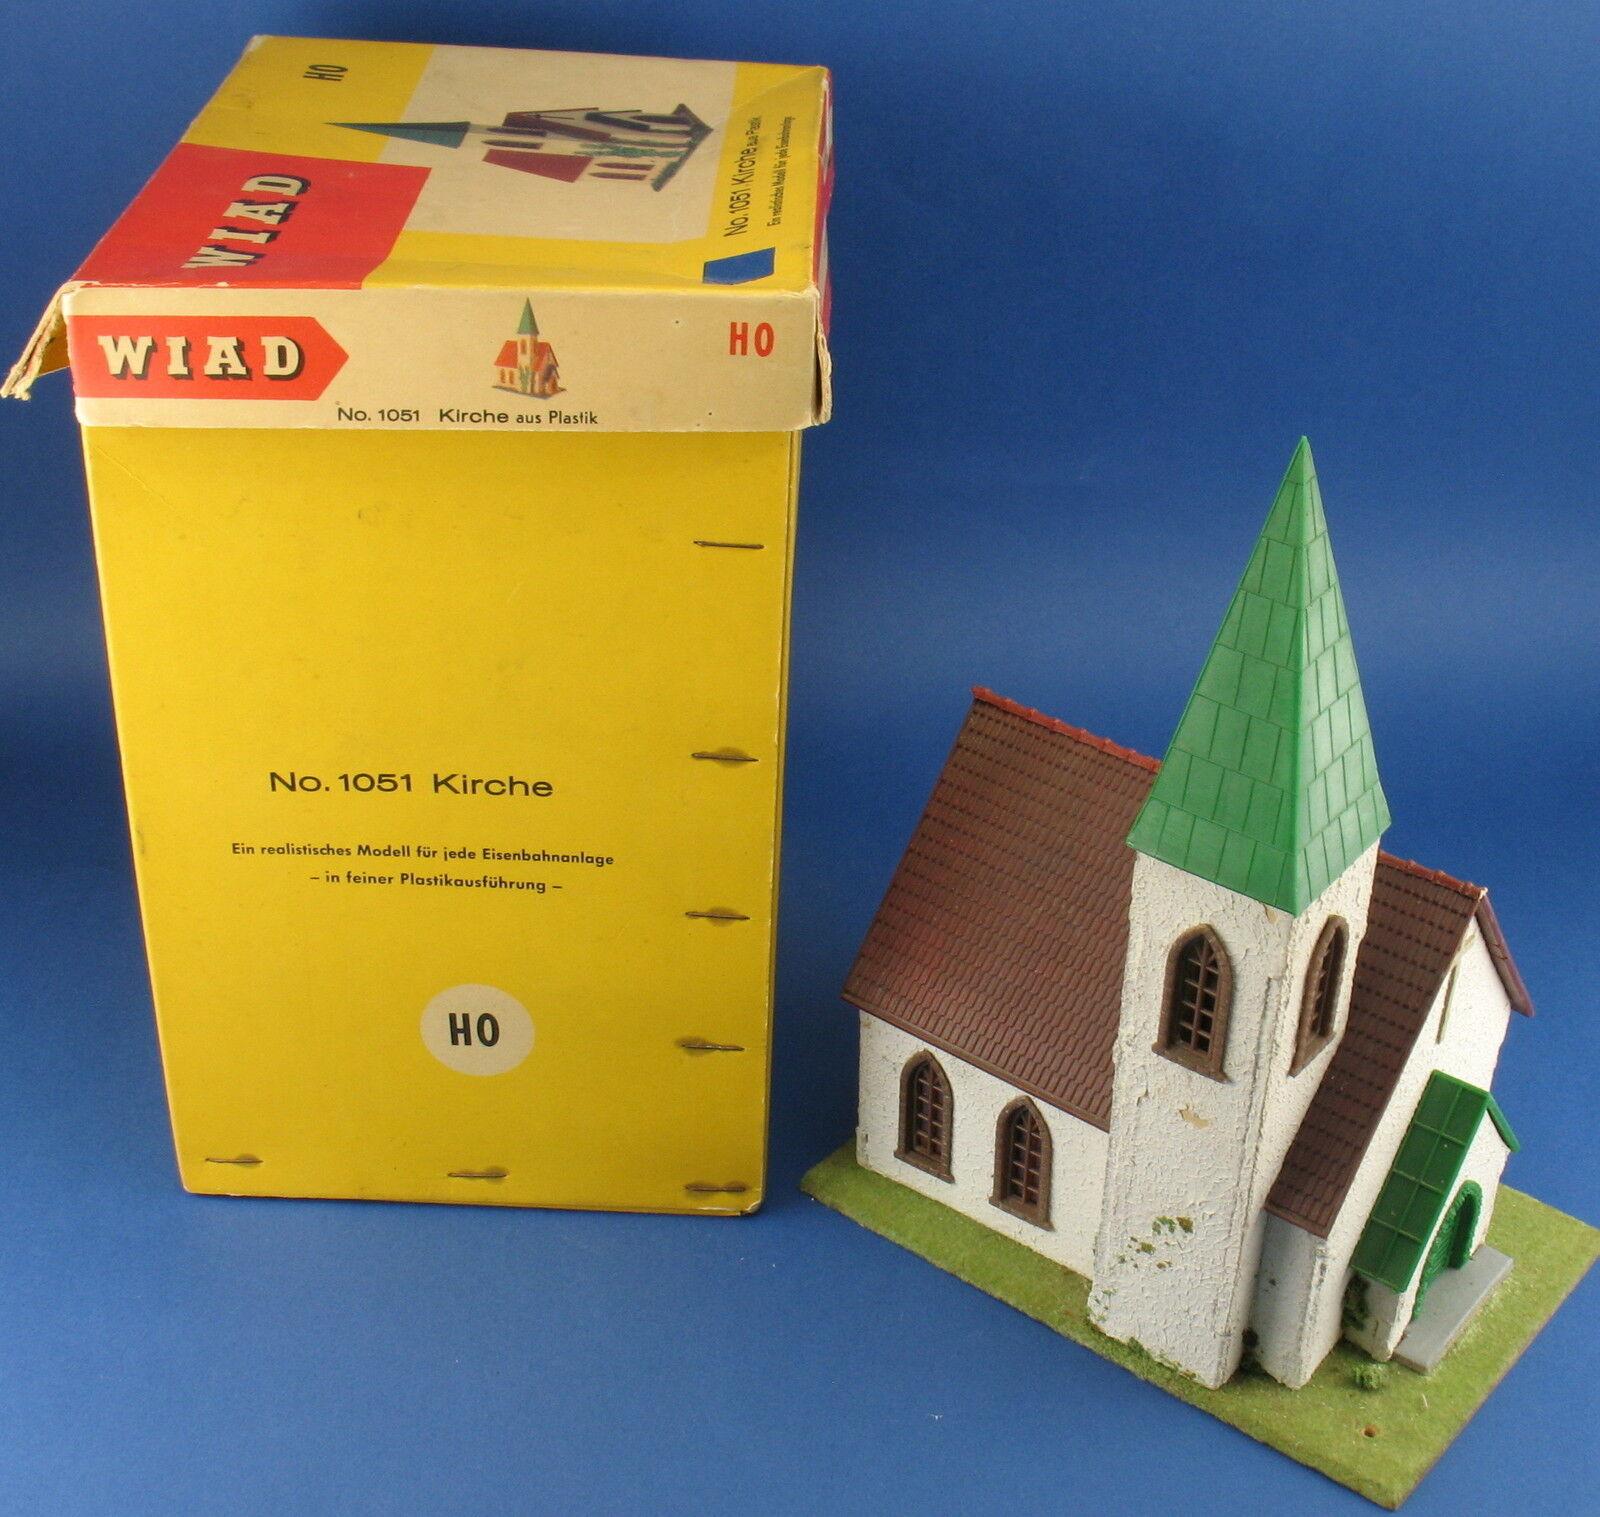 Modelo WIAD 1051 - Kielce - Iglesia - Holtz - fatigmore - ovp - h0 Bassac